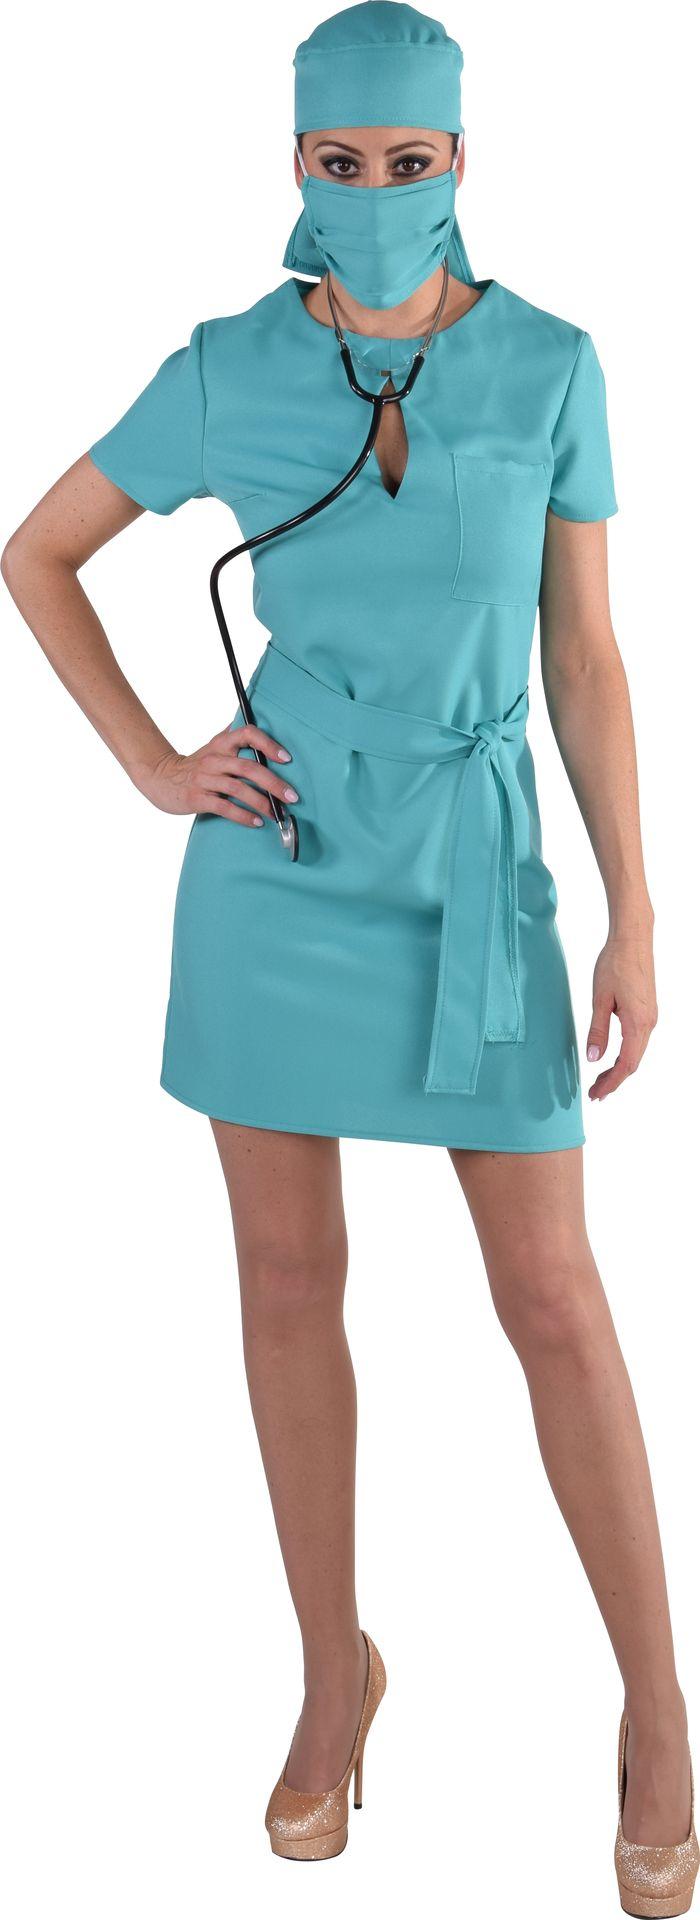 Korte chirurg jurk dames